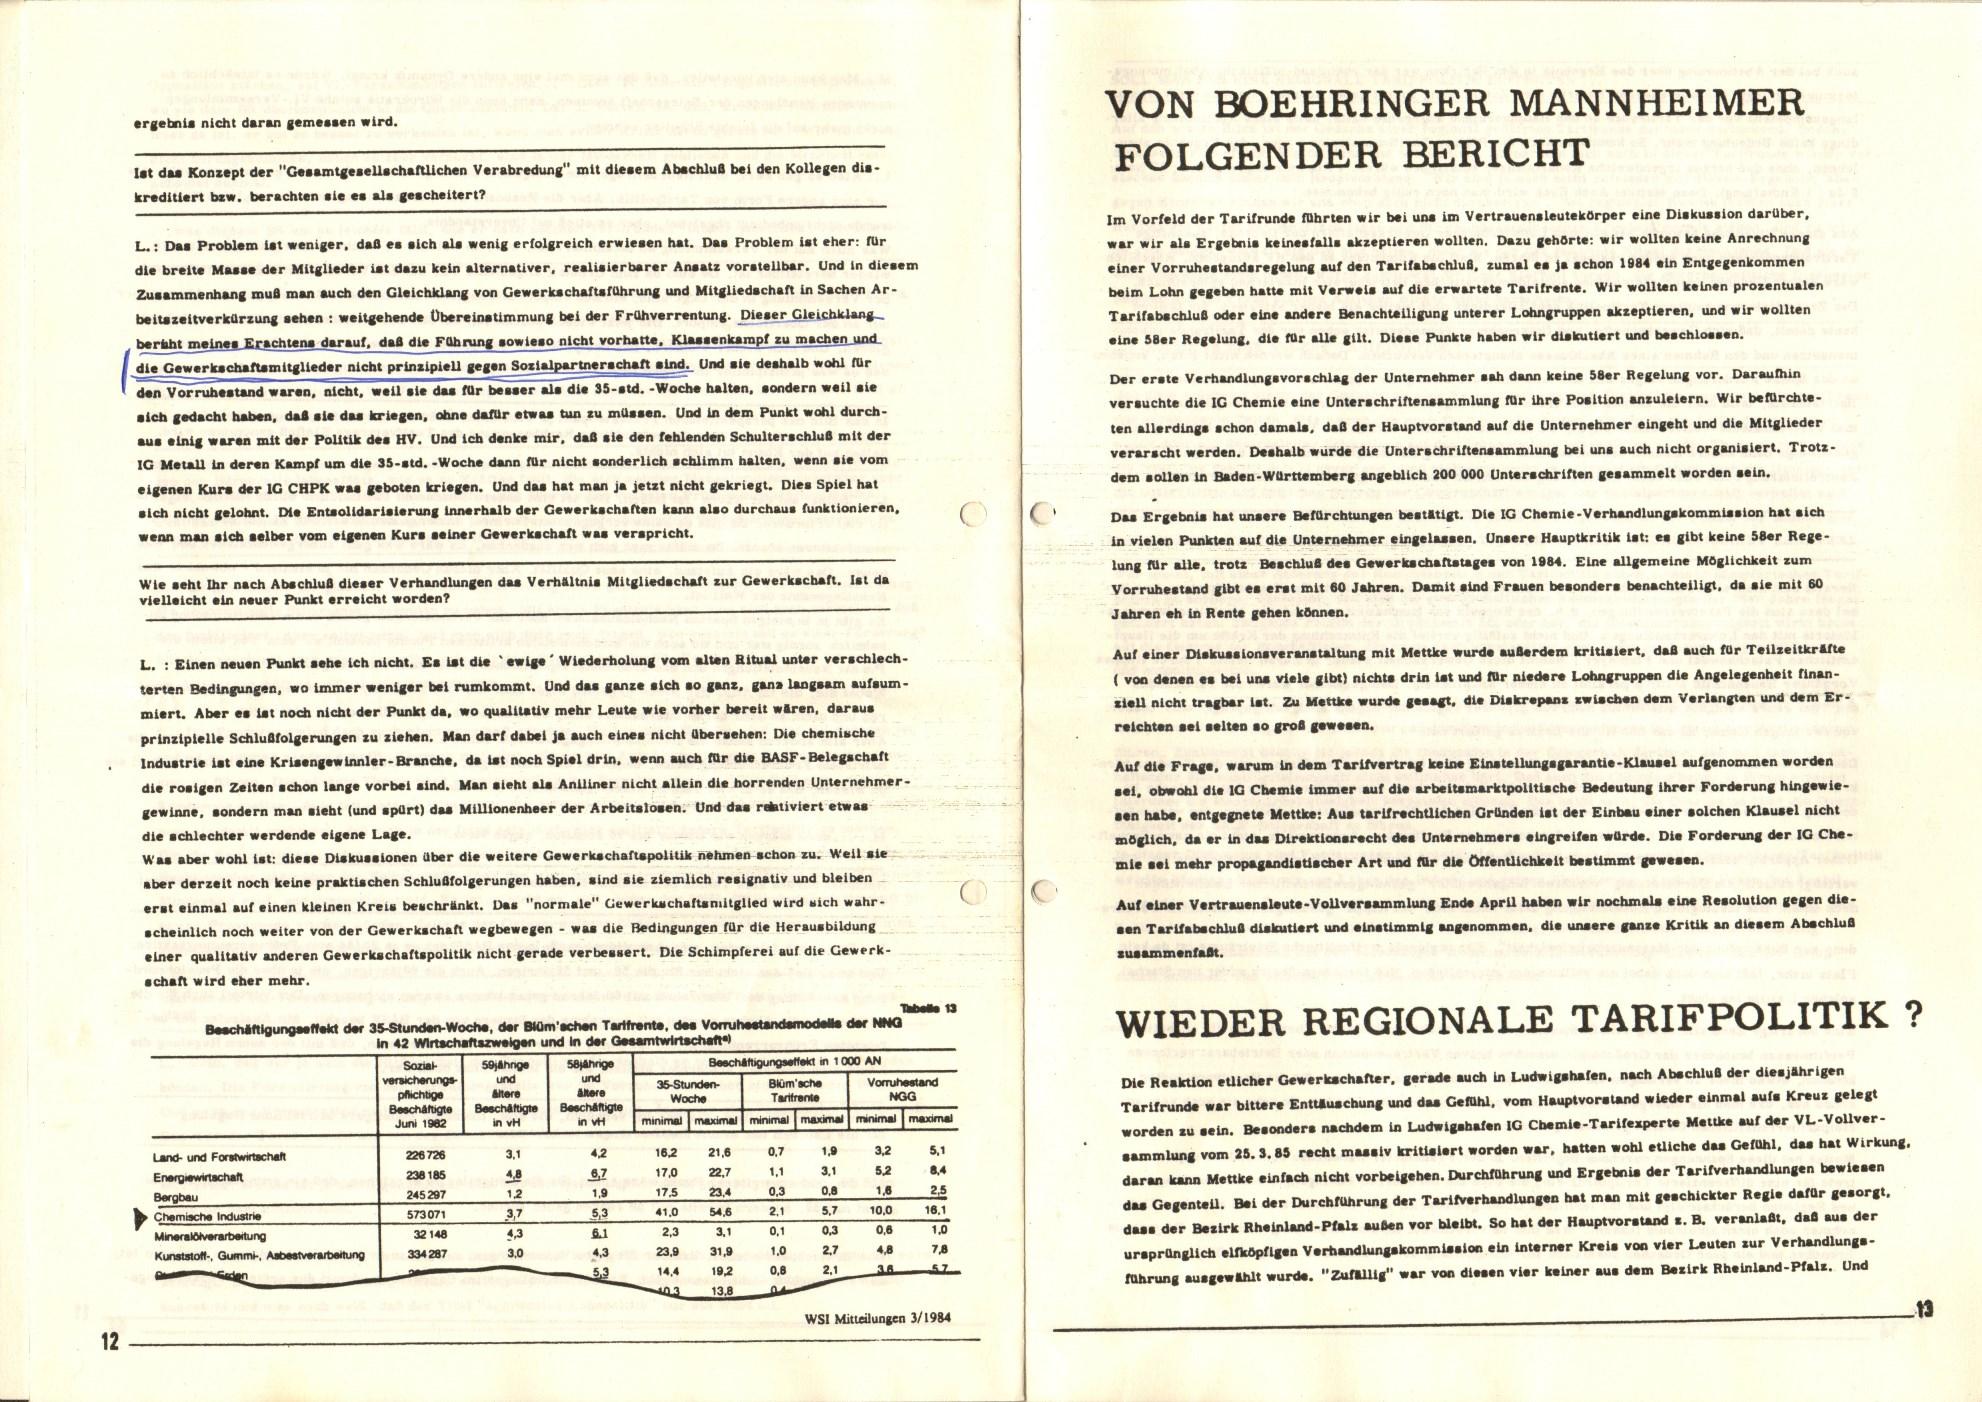 Ludwigshafen_BASF_Chemie_Tarifrunde_1985_07